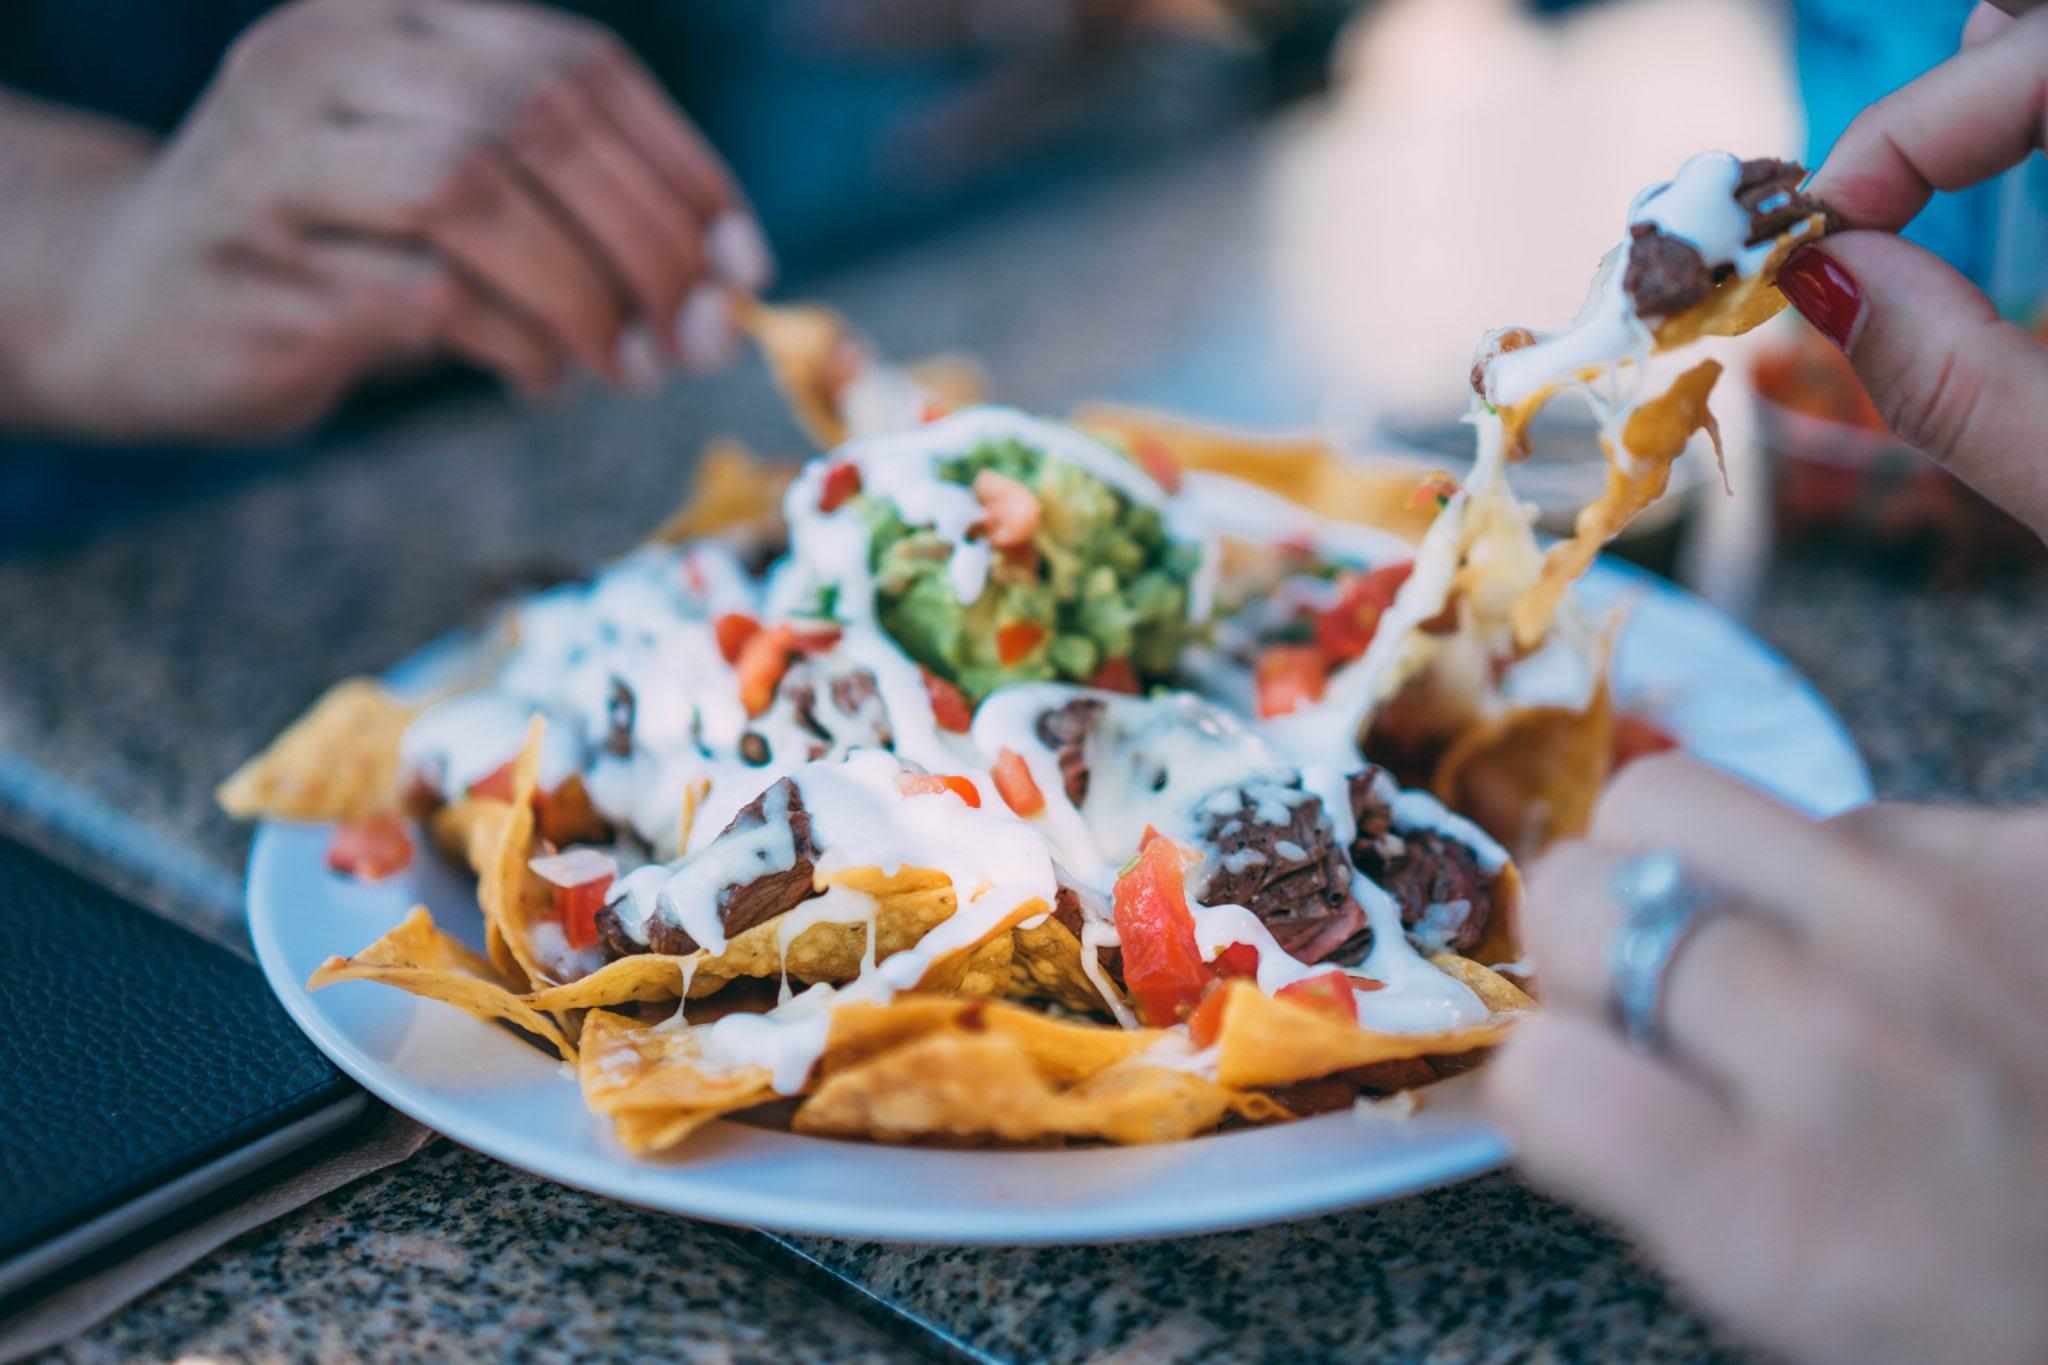 nachos, people, hands, seasonal restaurants, sales